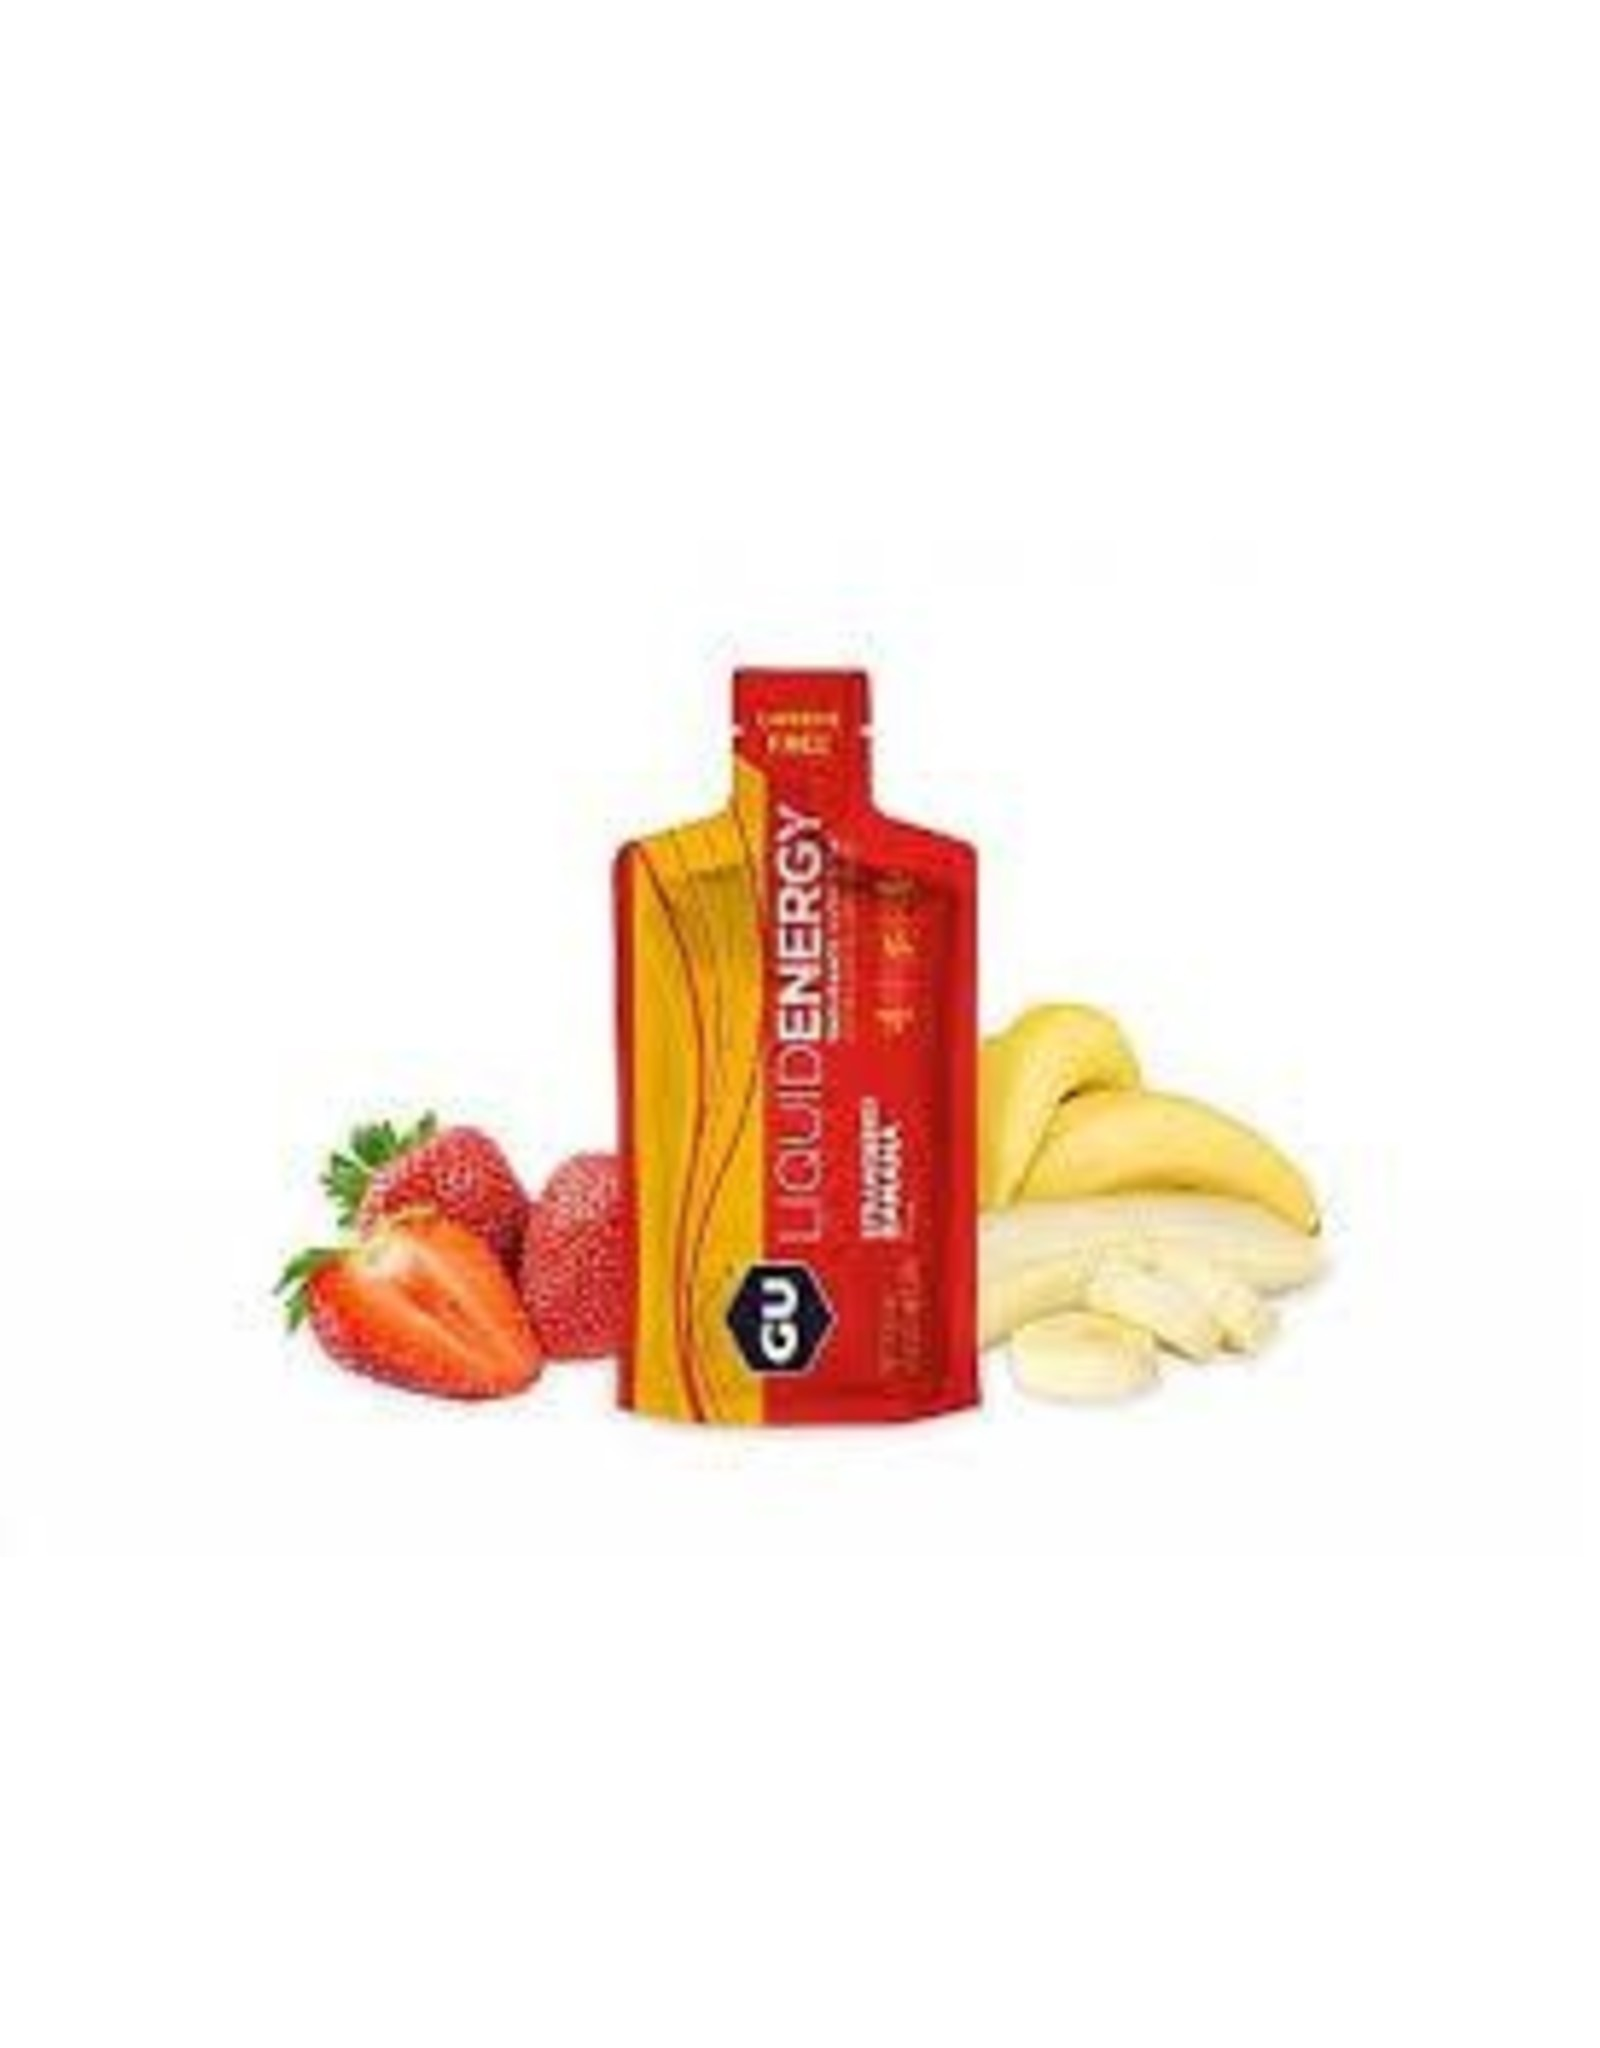 GU Energy Labs GU Liquid Energy Strawberry Banana Box of 12